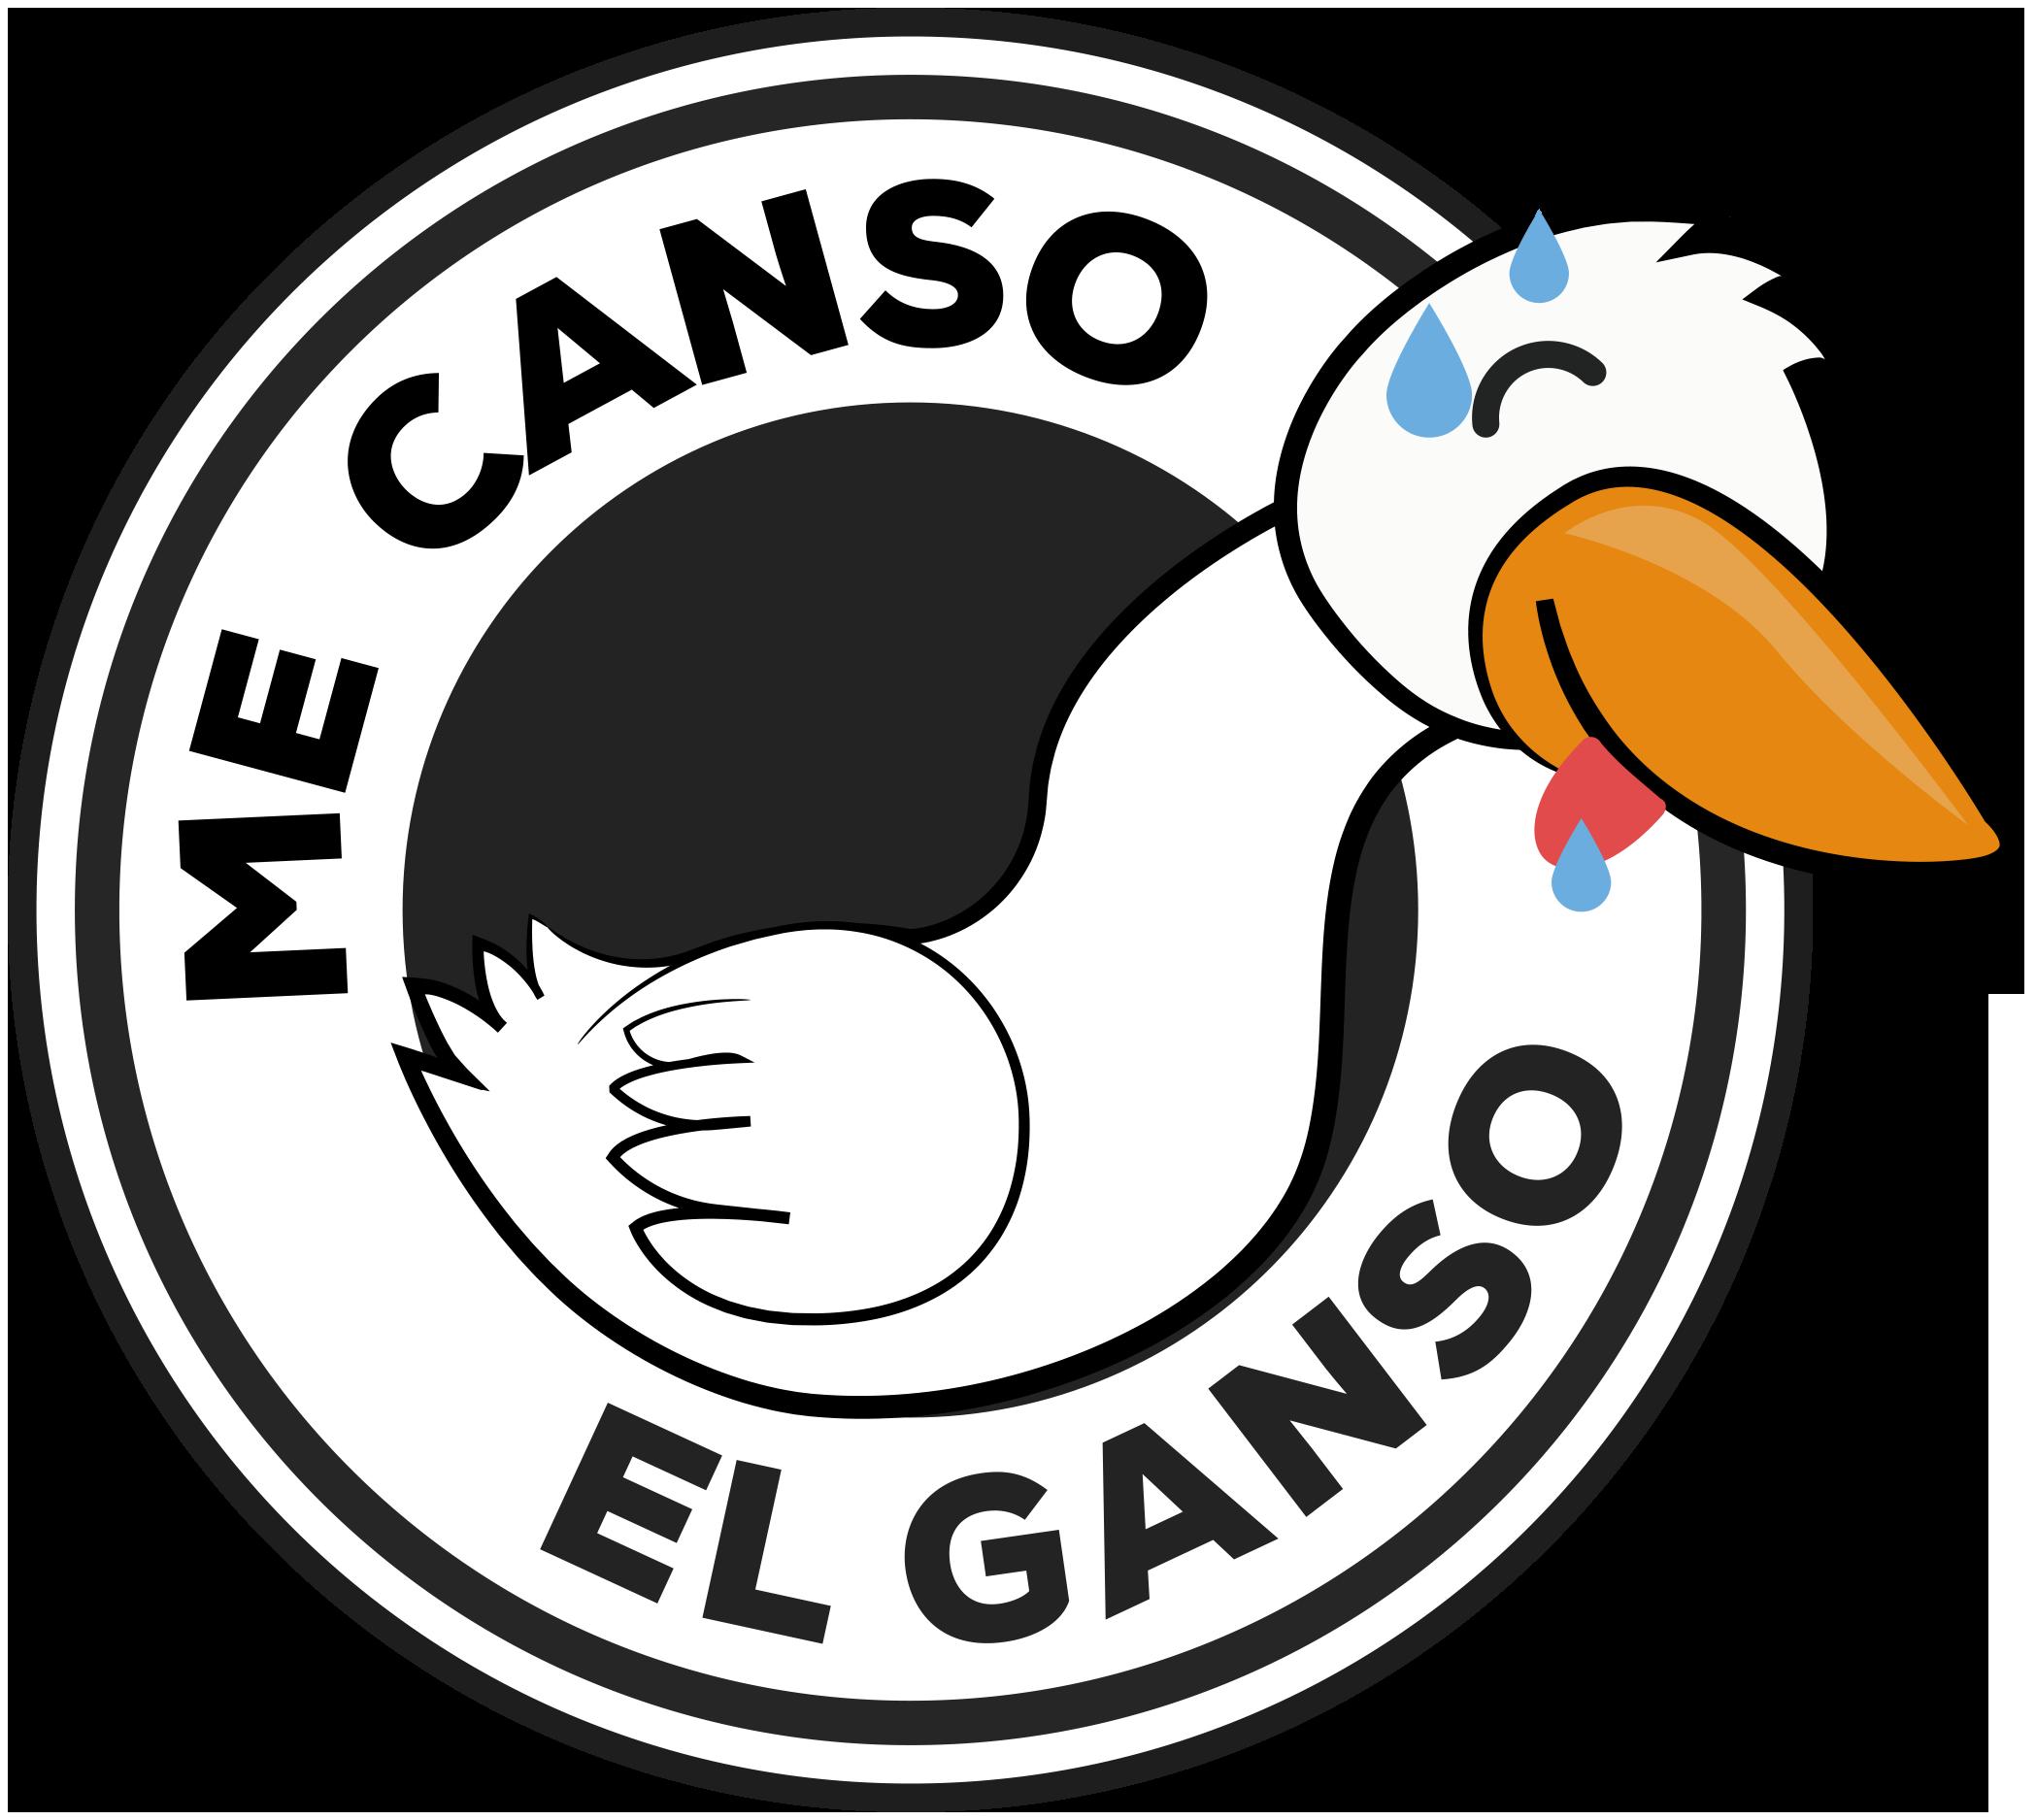 Me canso el Ganso (by Ba-k)